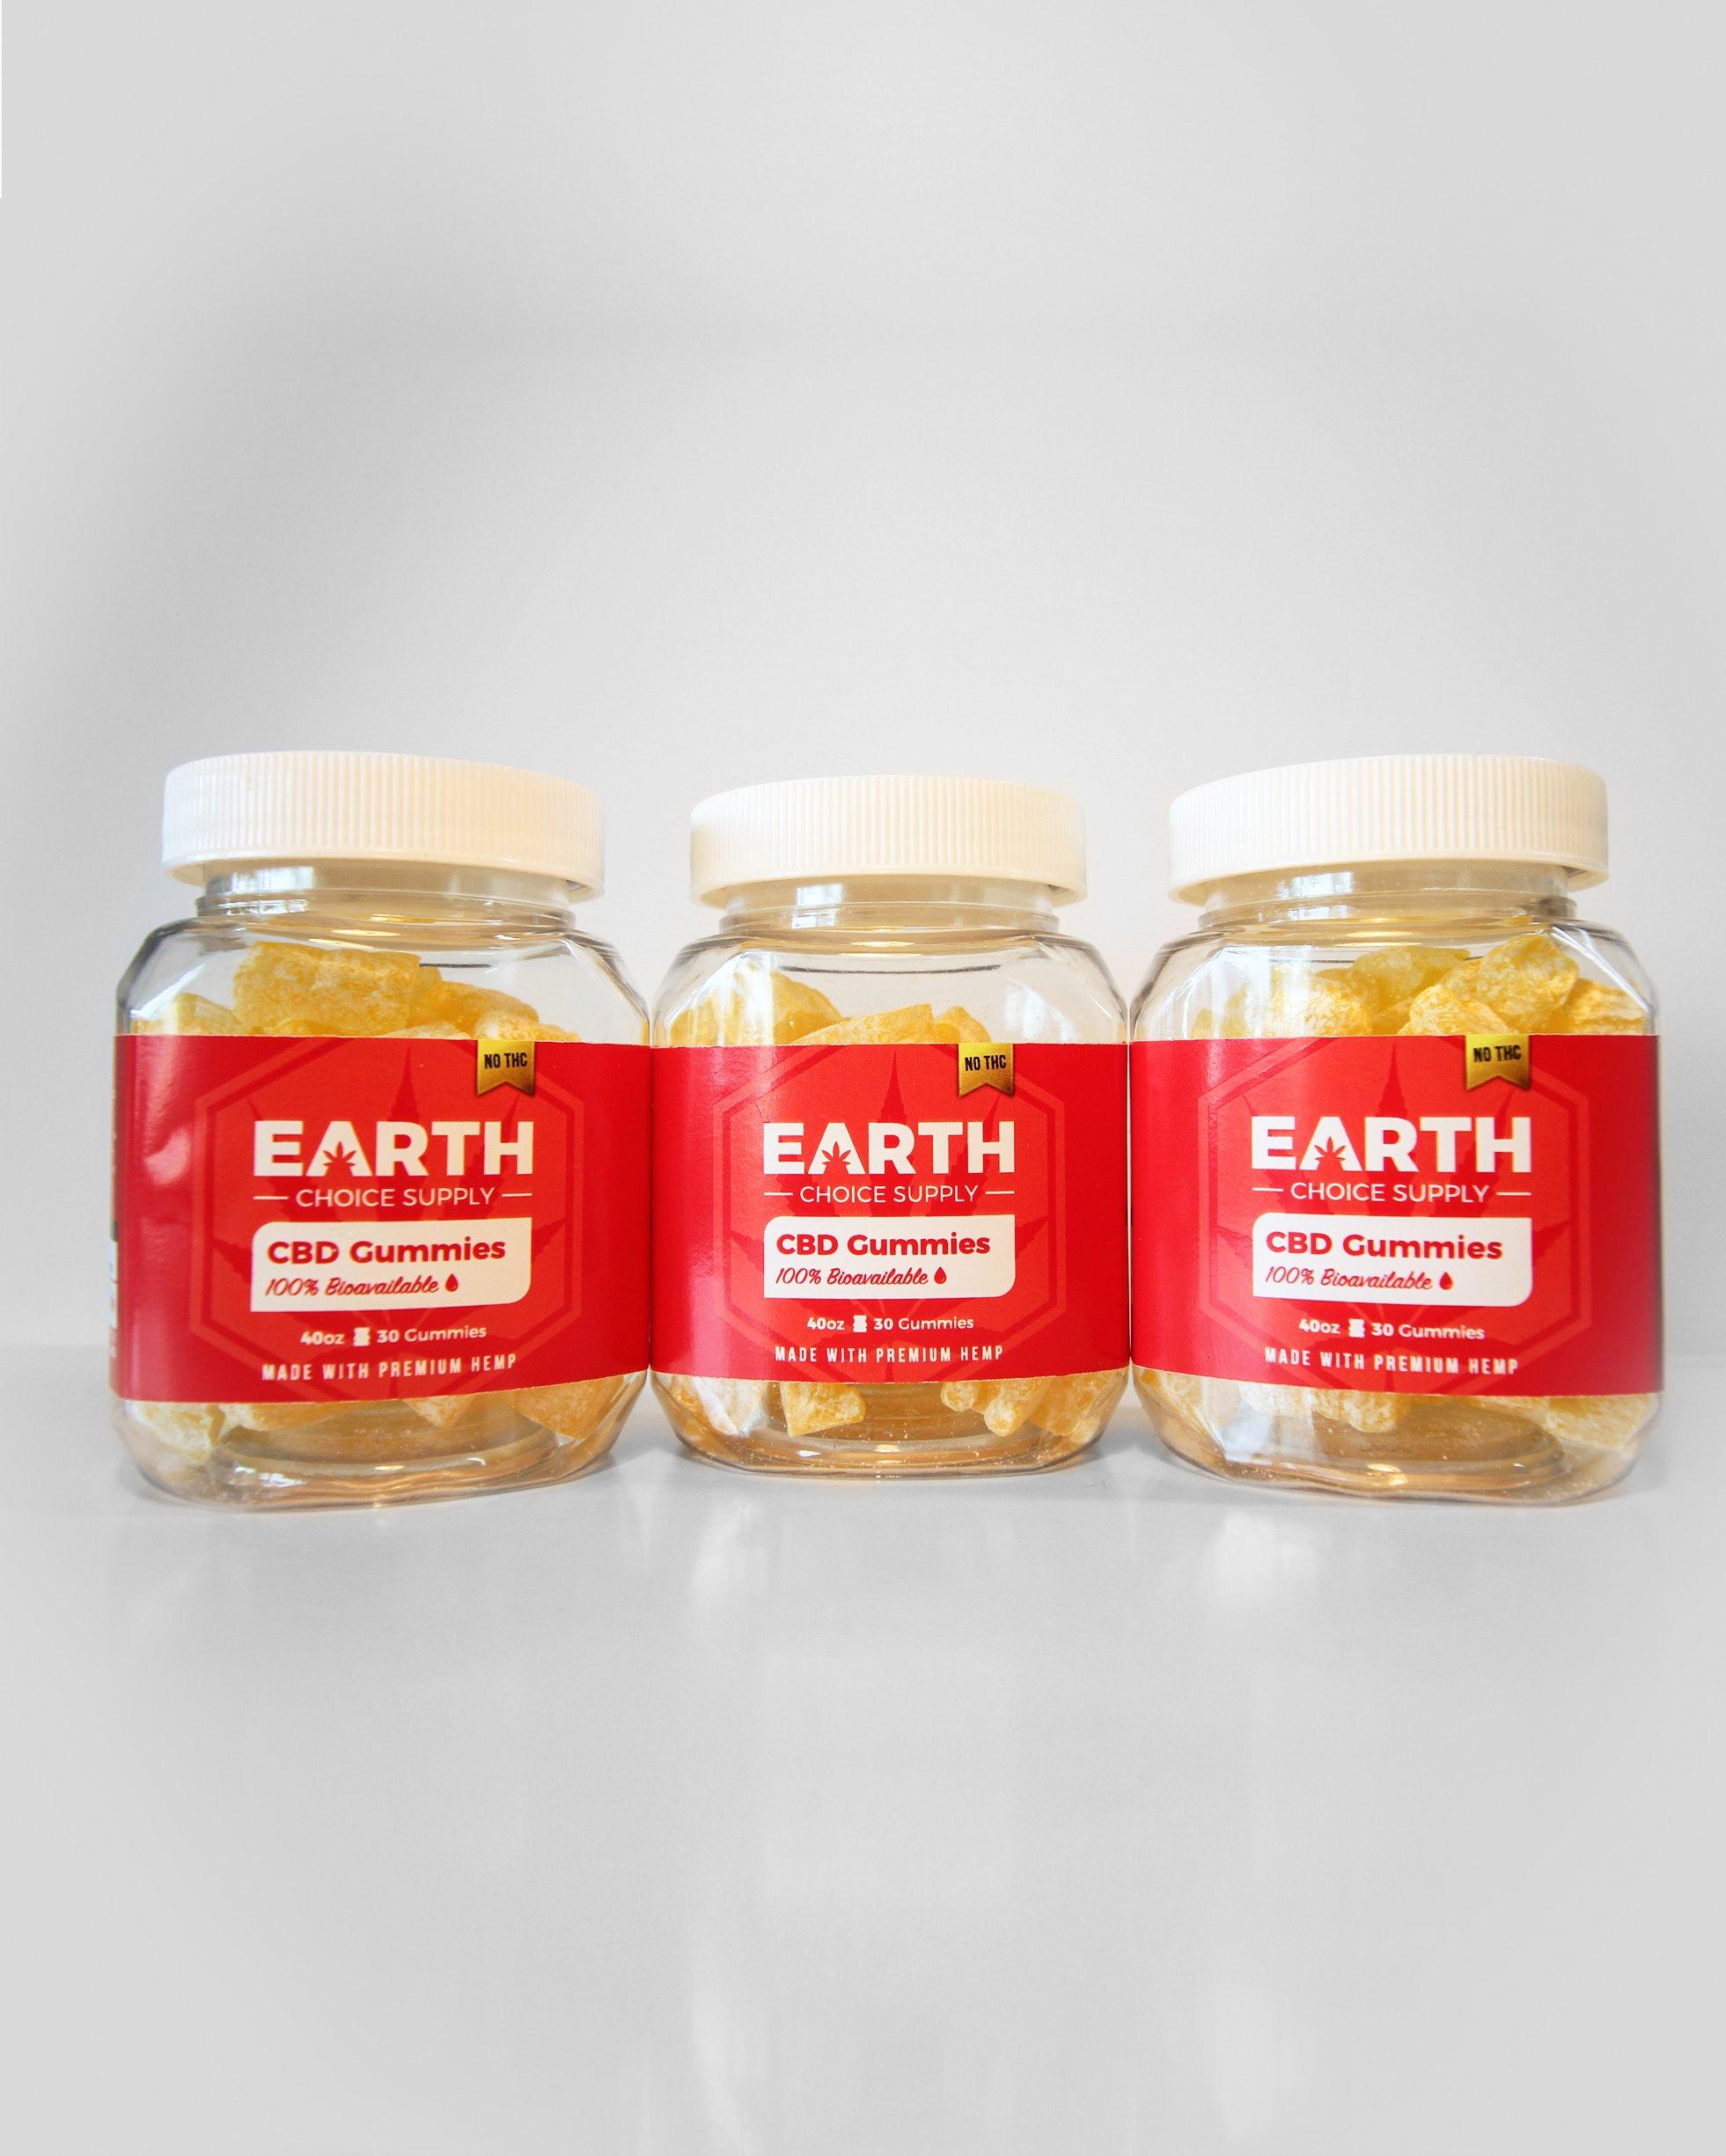 Earth Choice Supply